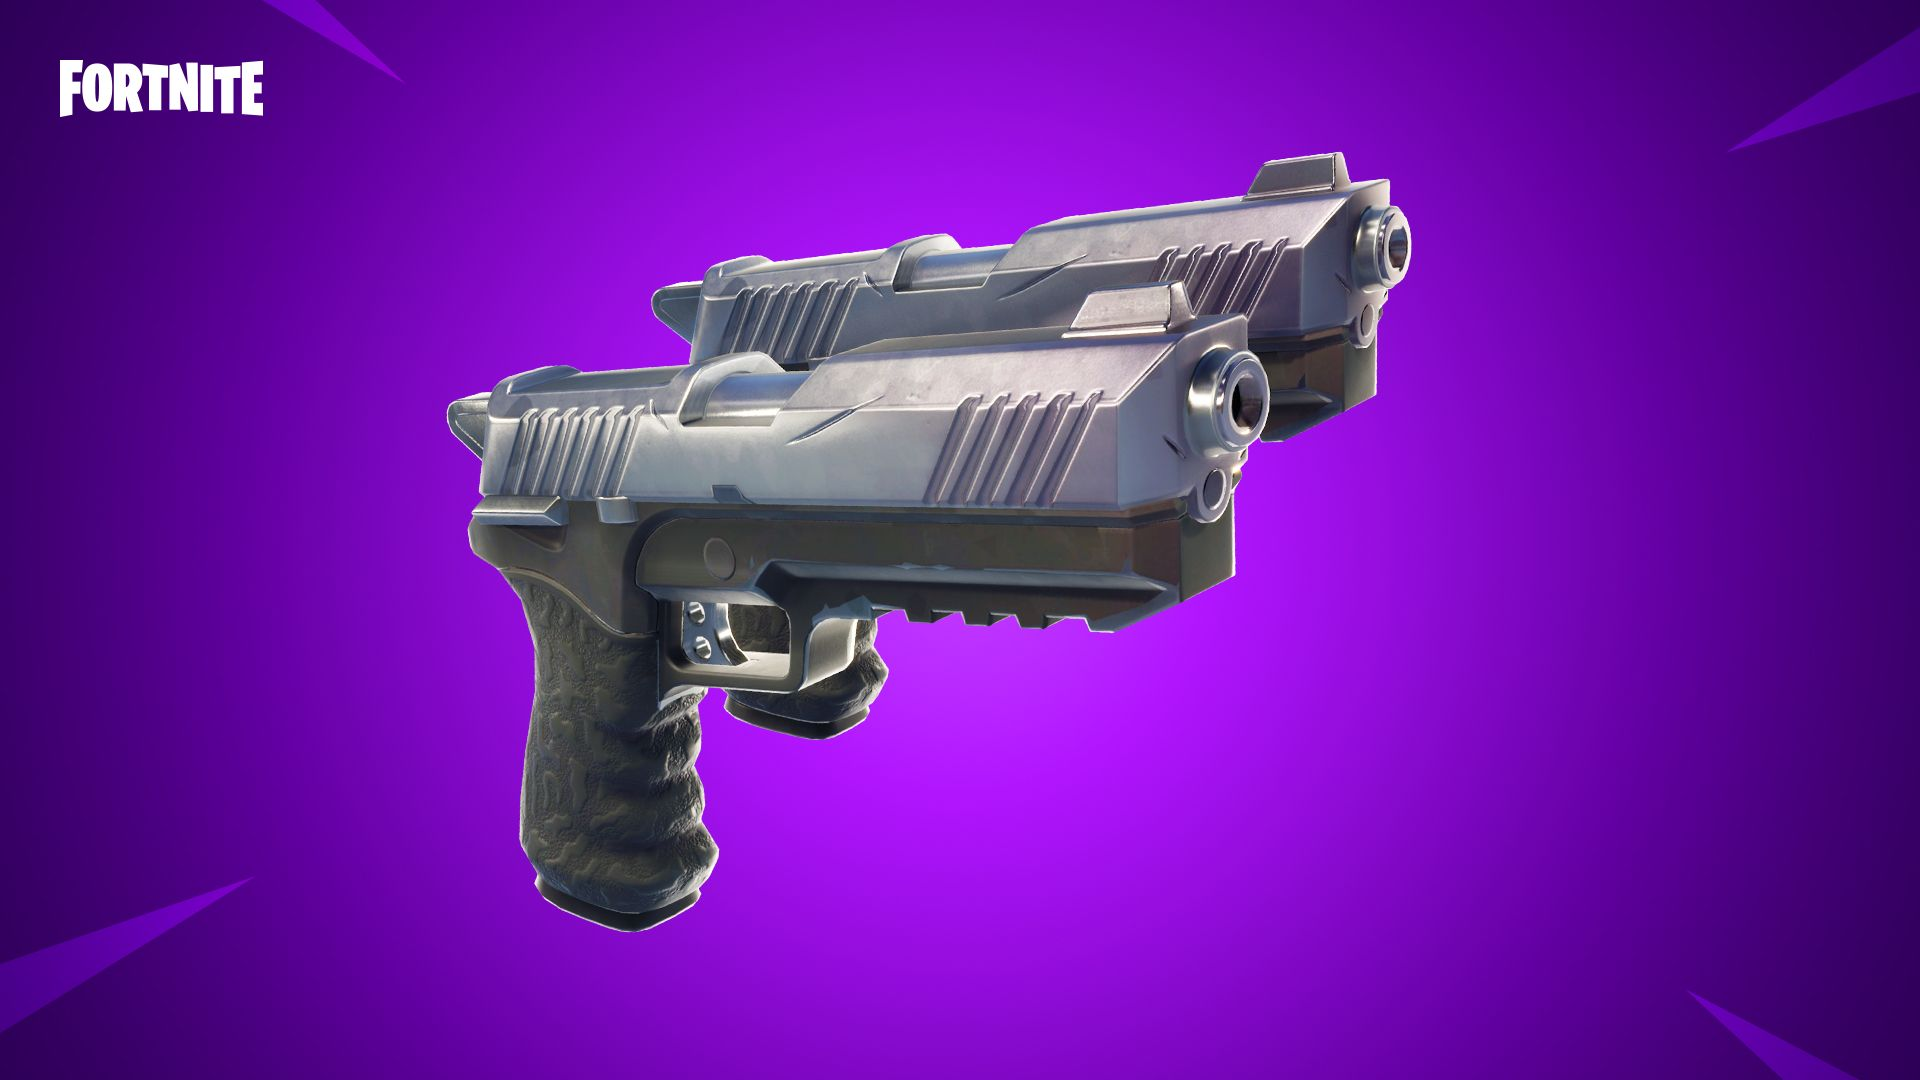 Fortnite Update 165 45 Adds Dual Pistols Back Blings